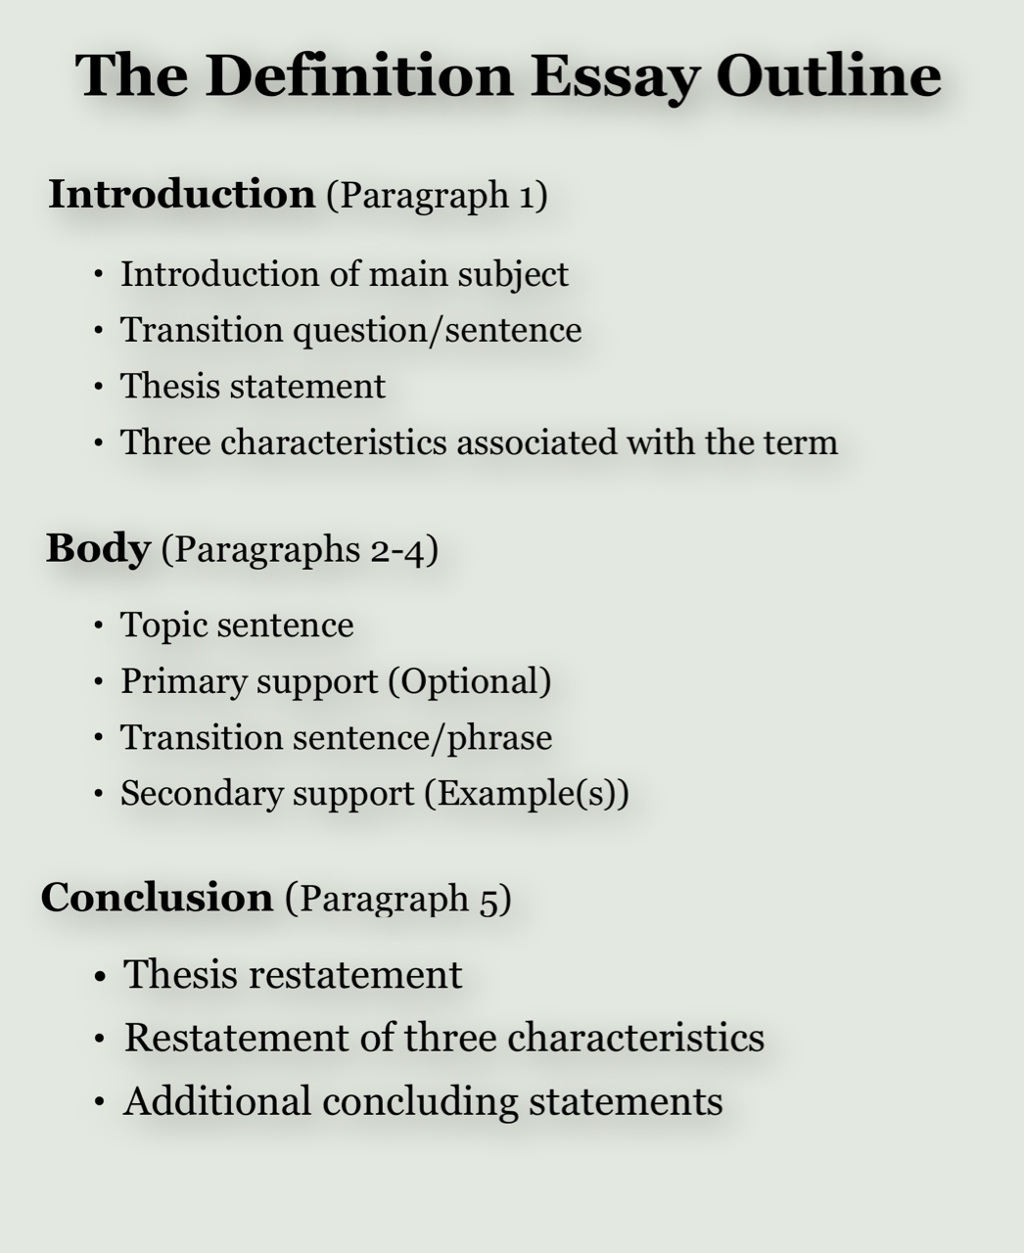 Definition Essay Outline